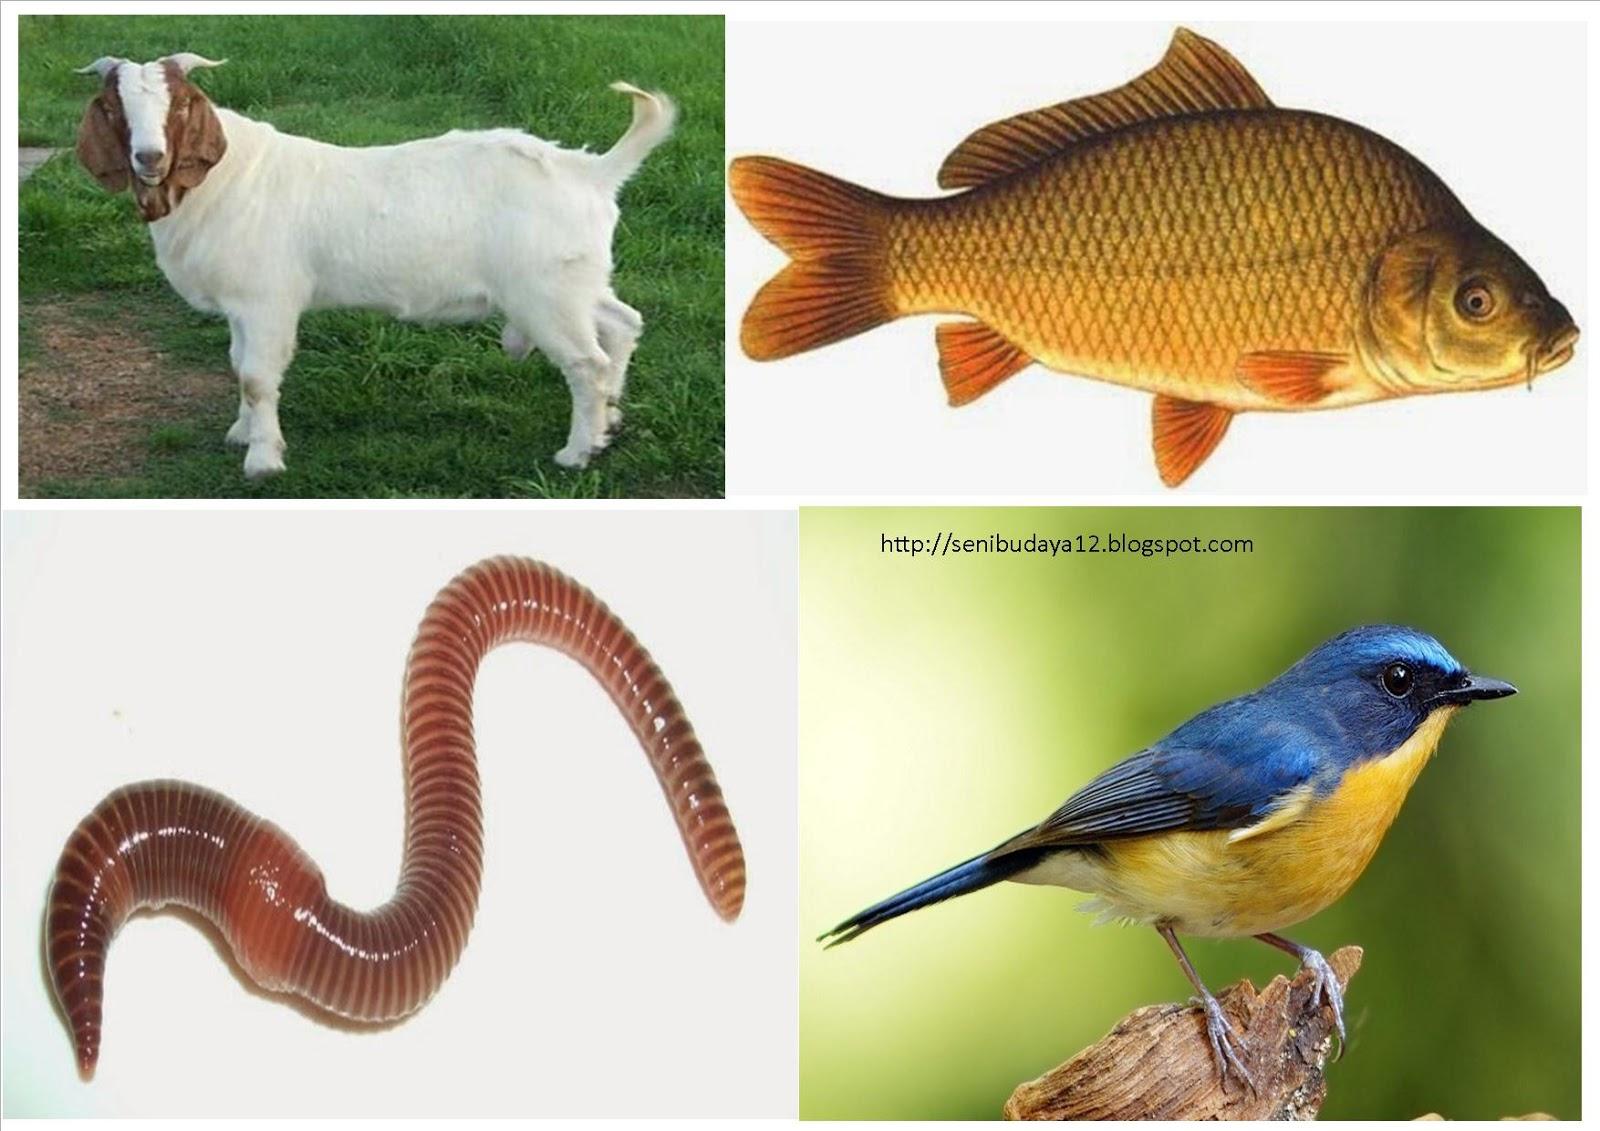 57 Gambar Hewan A Vertebrata Terbaik